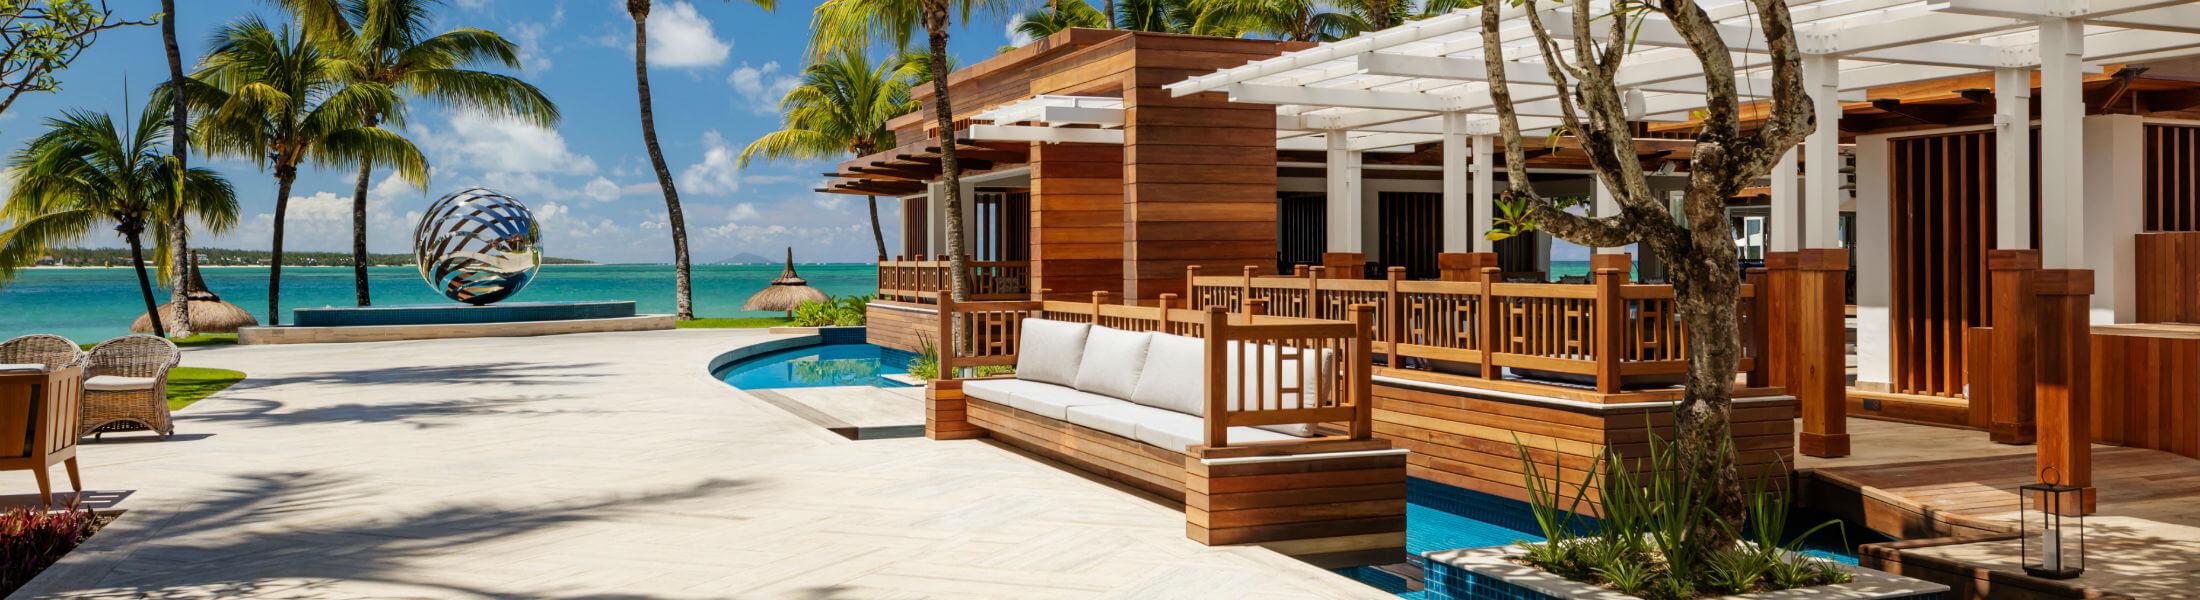 One&Only Le Saint Geran, Mauritius - external bar